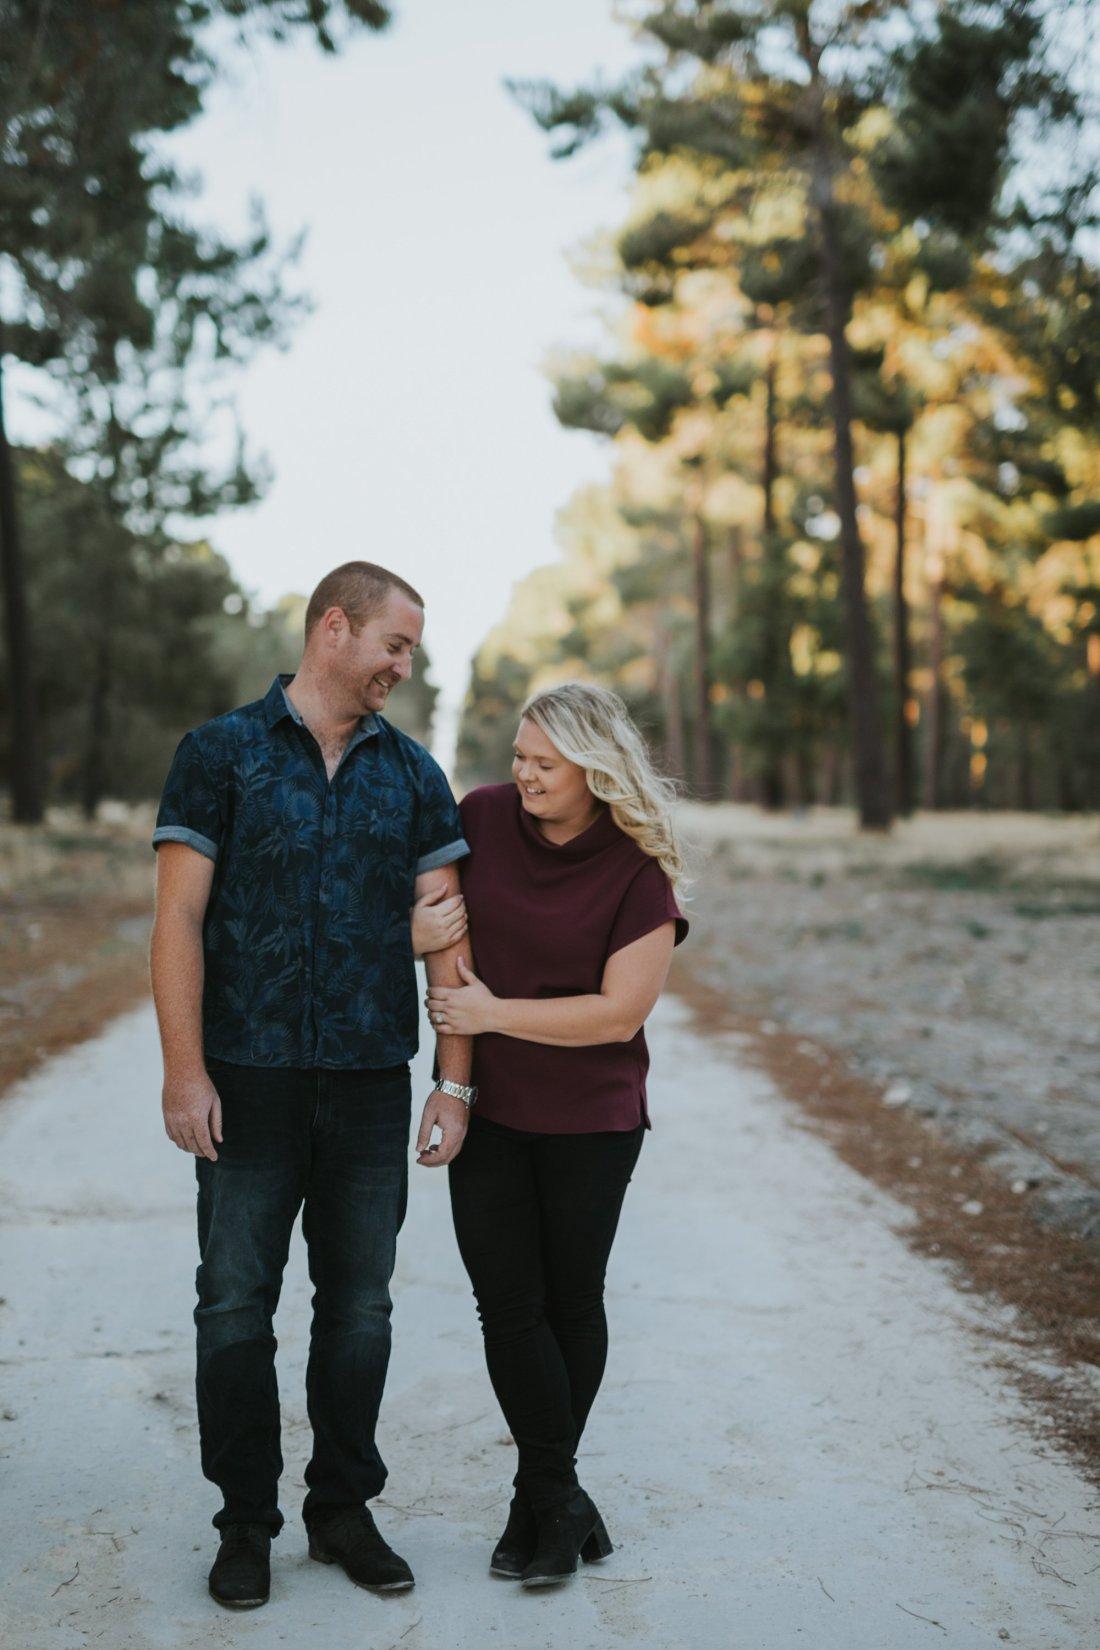 Perth Wedding Photographer | Pines Forrest Engagment | Ebony Blush Photography | Corry + Reece | Pre Wedding108